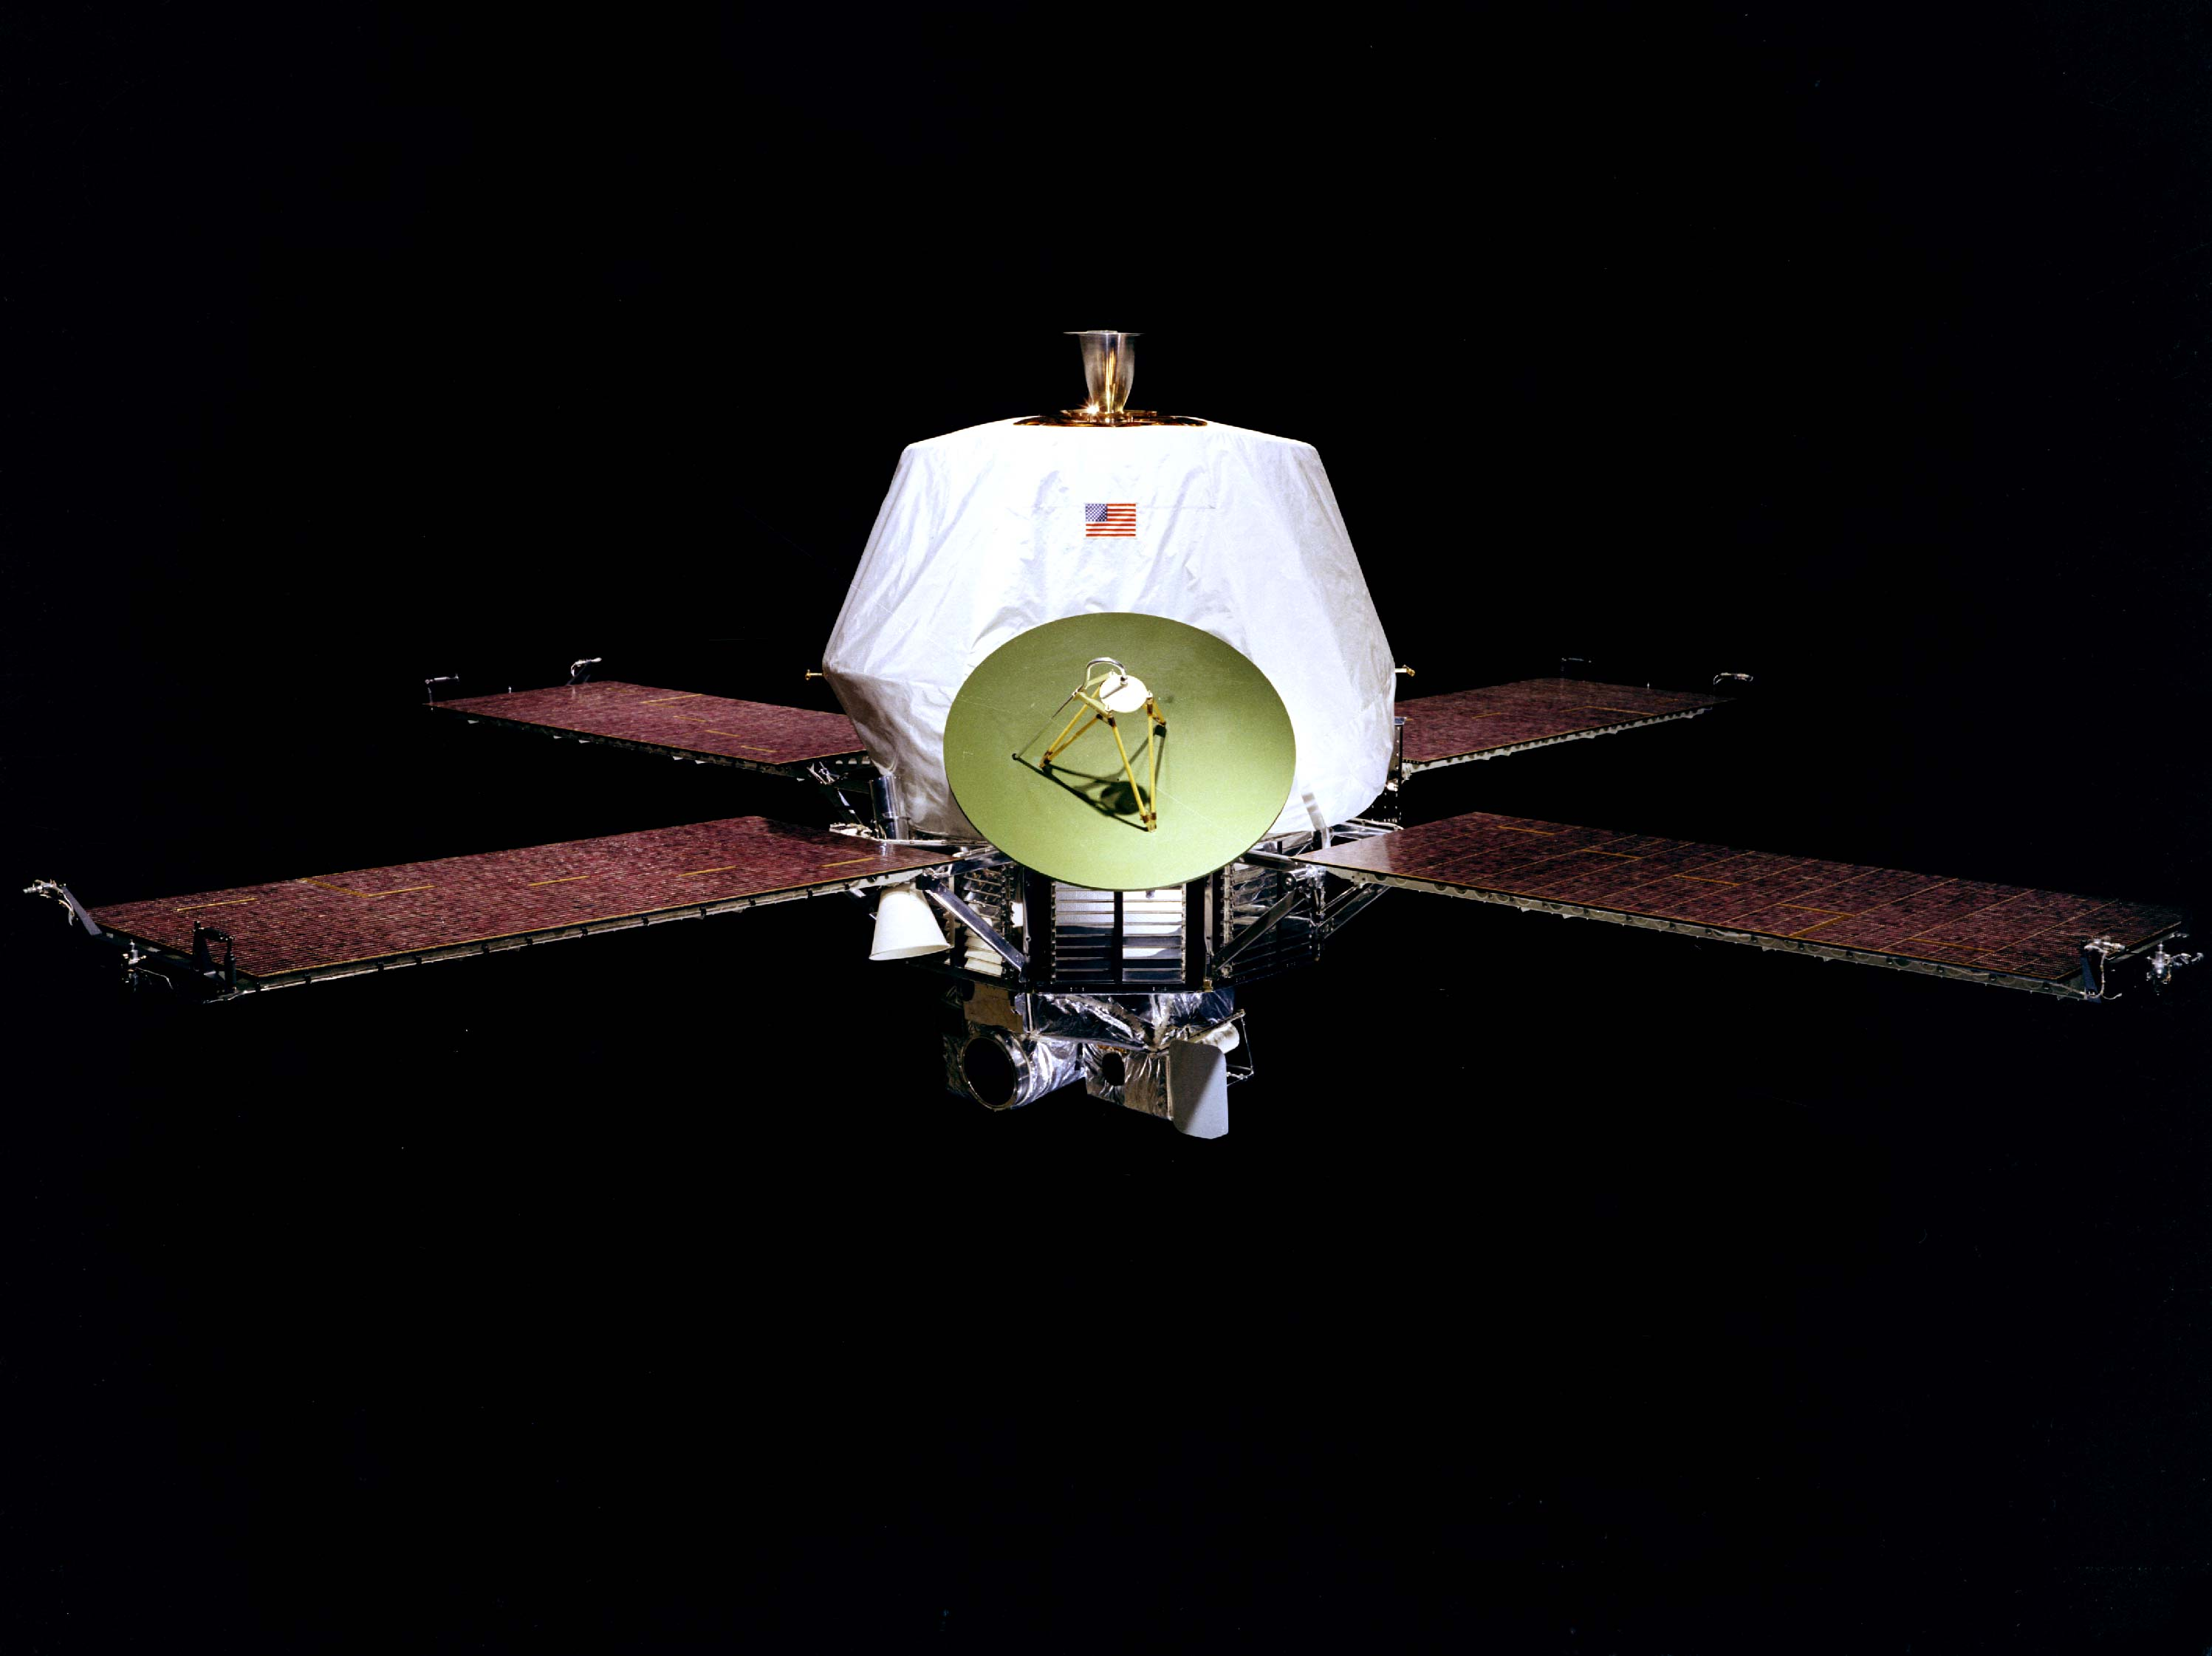 immagine di Mariner 9